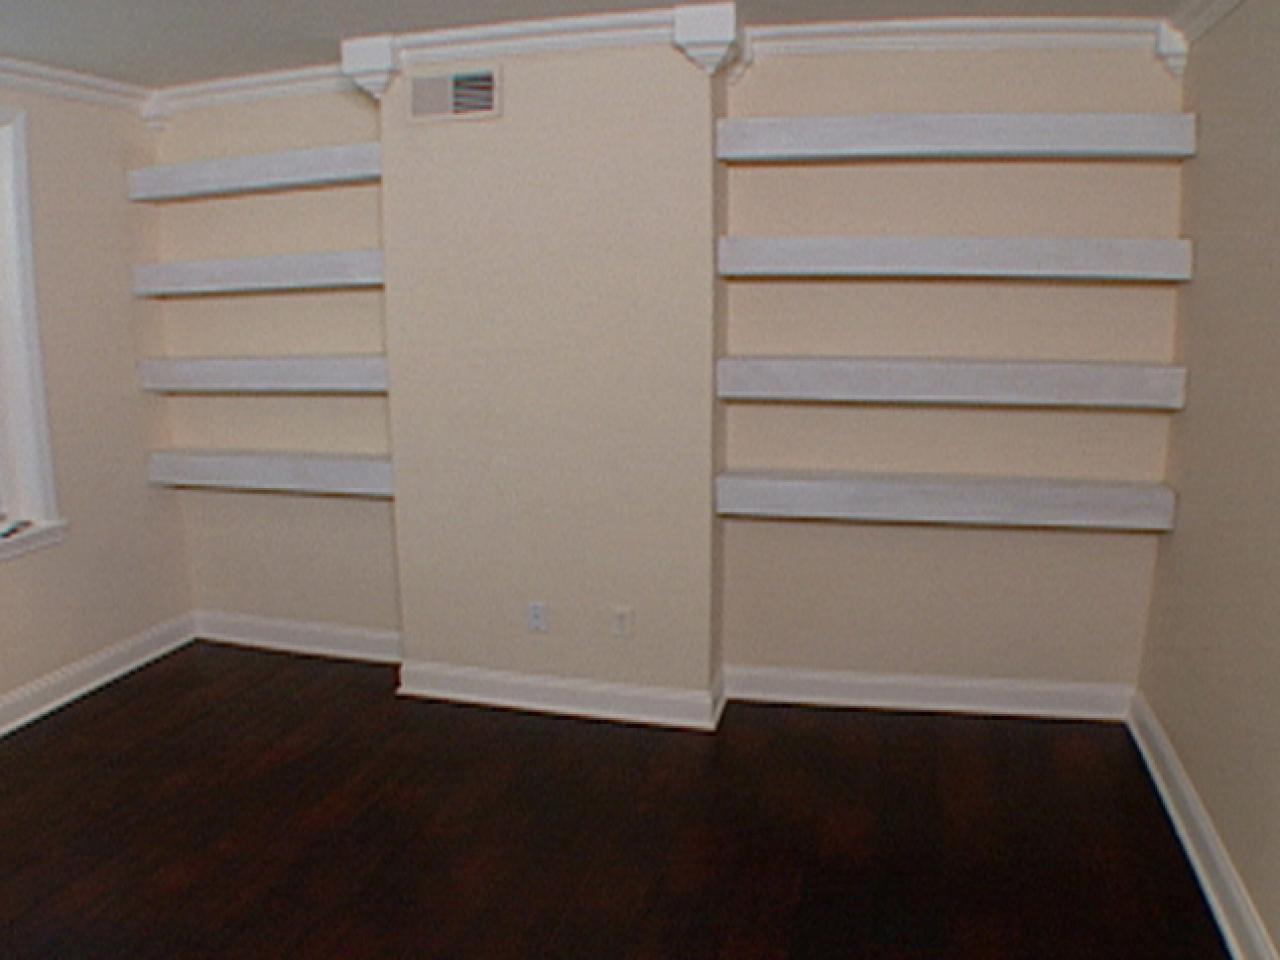 Updating Your Home Install Floating Shelves Hgtv